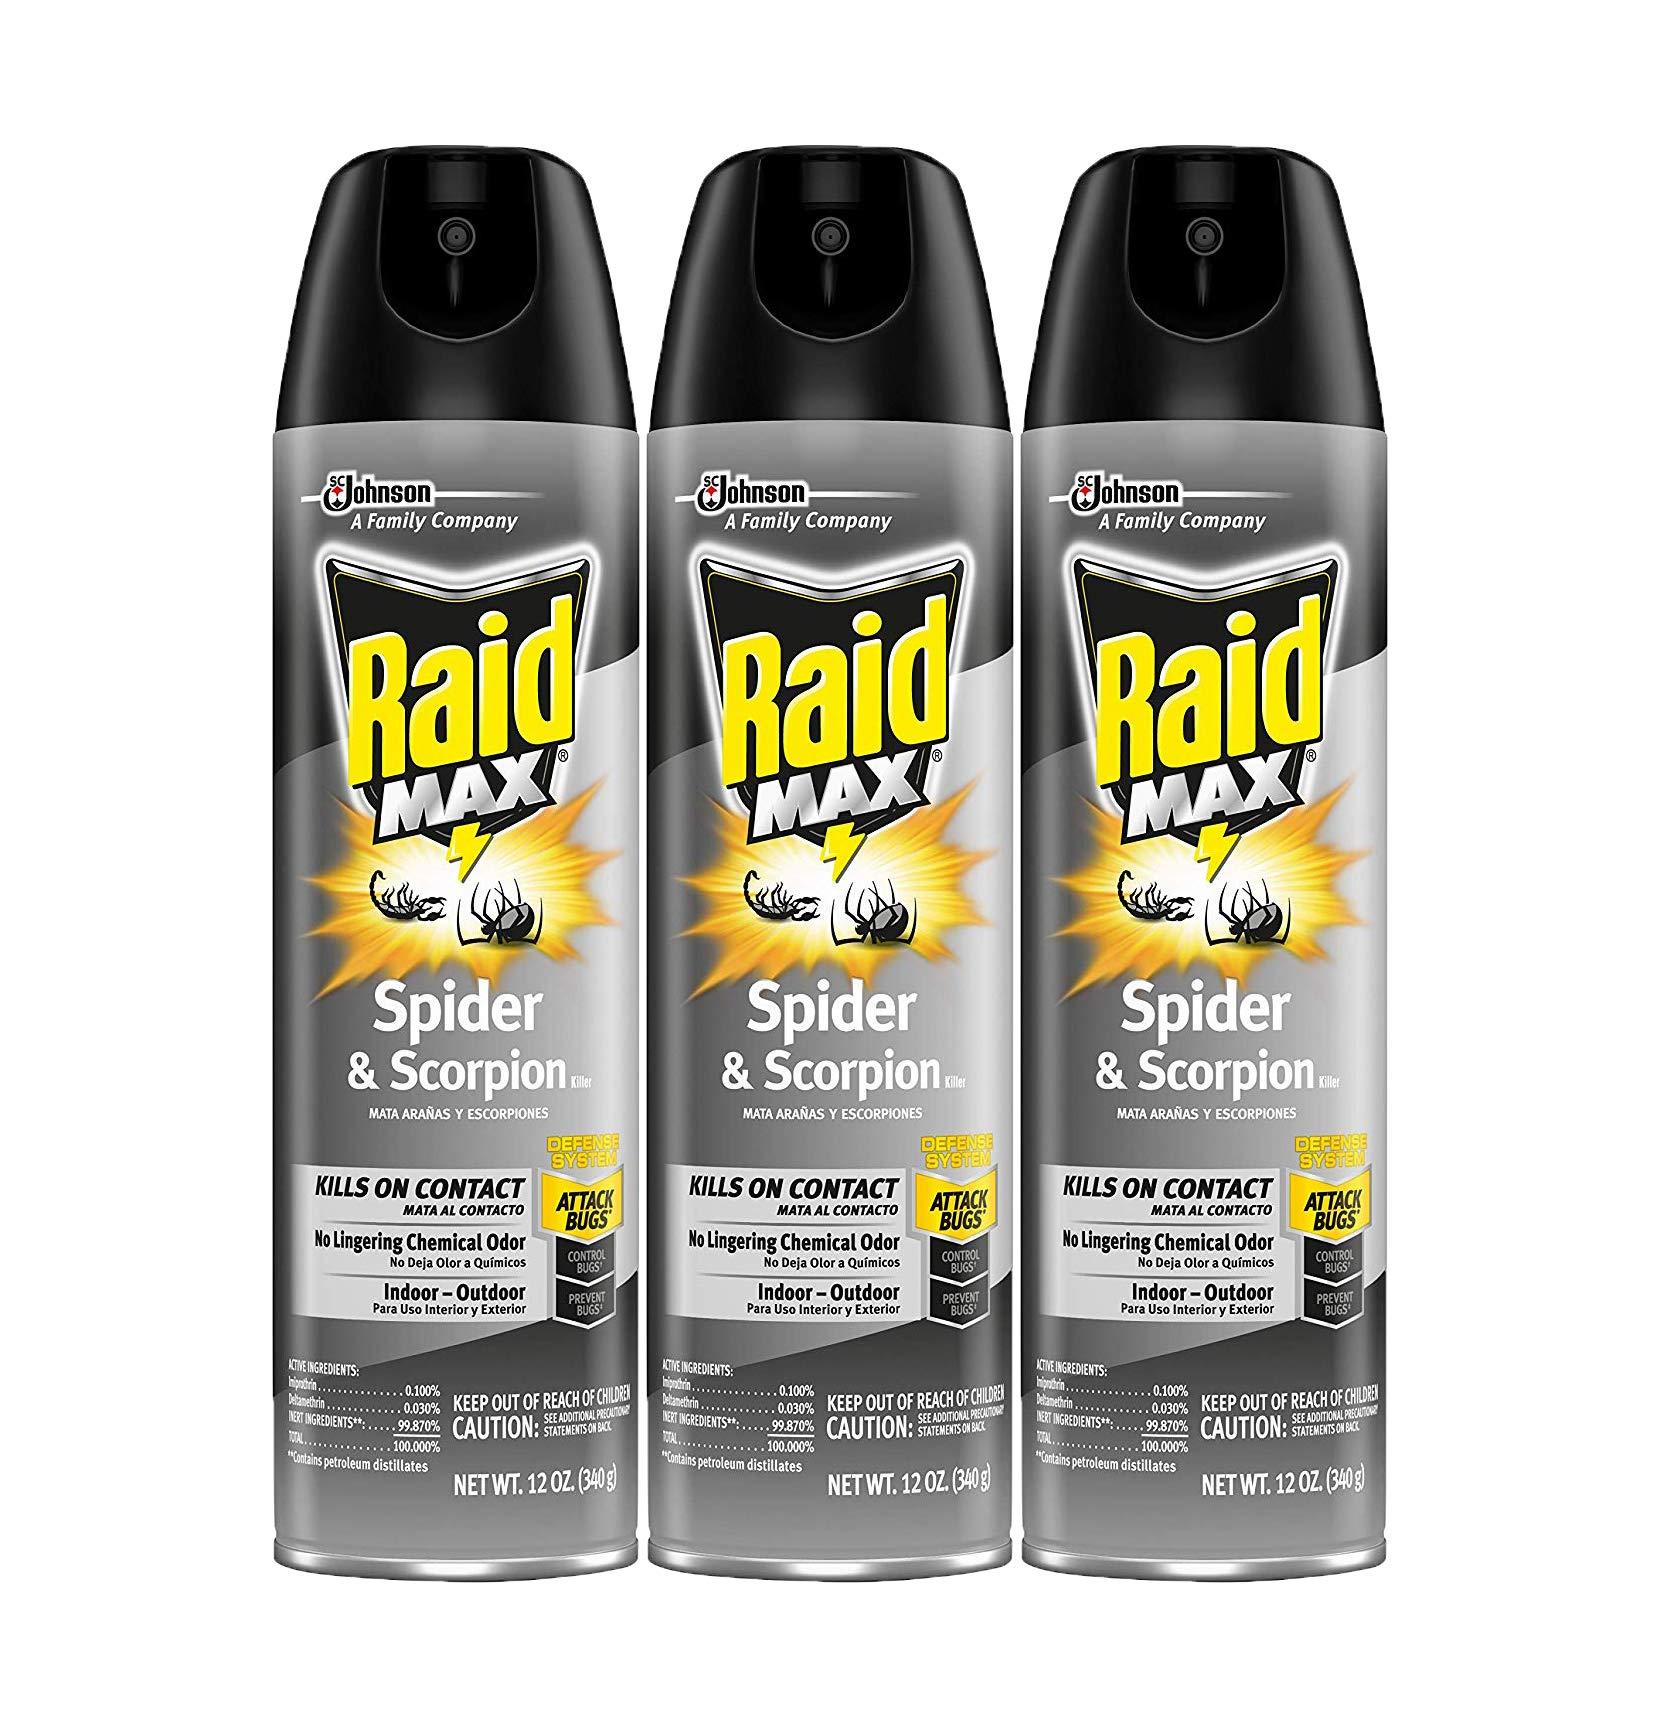 Raid Max Spider & Scorpion Killer, 12 OZ (Pack - 3) by Raid